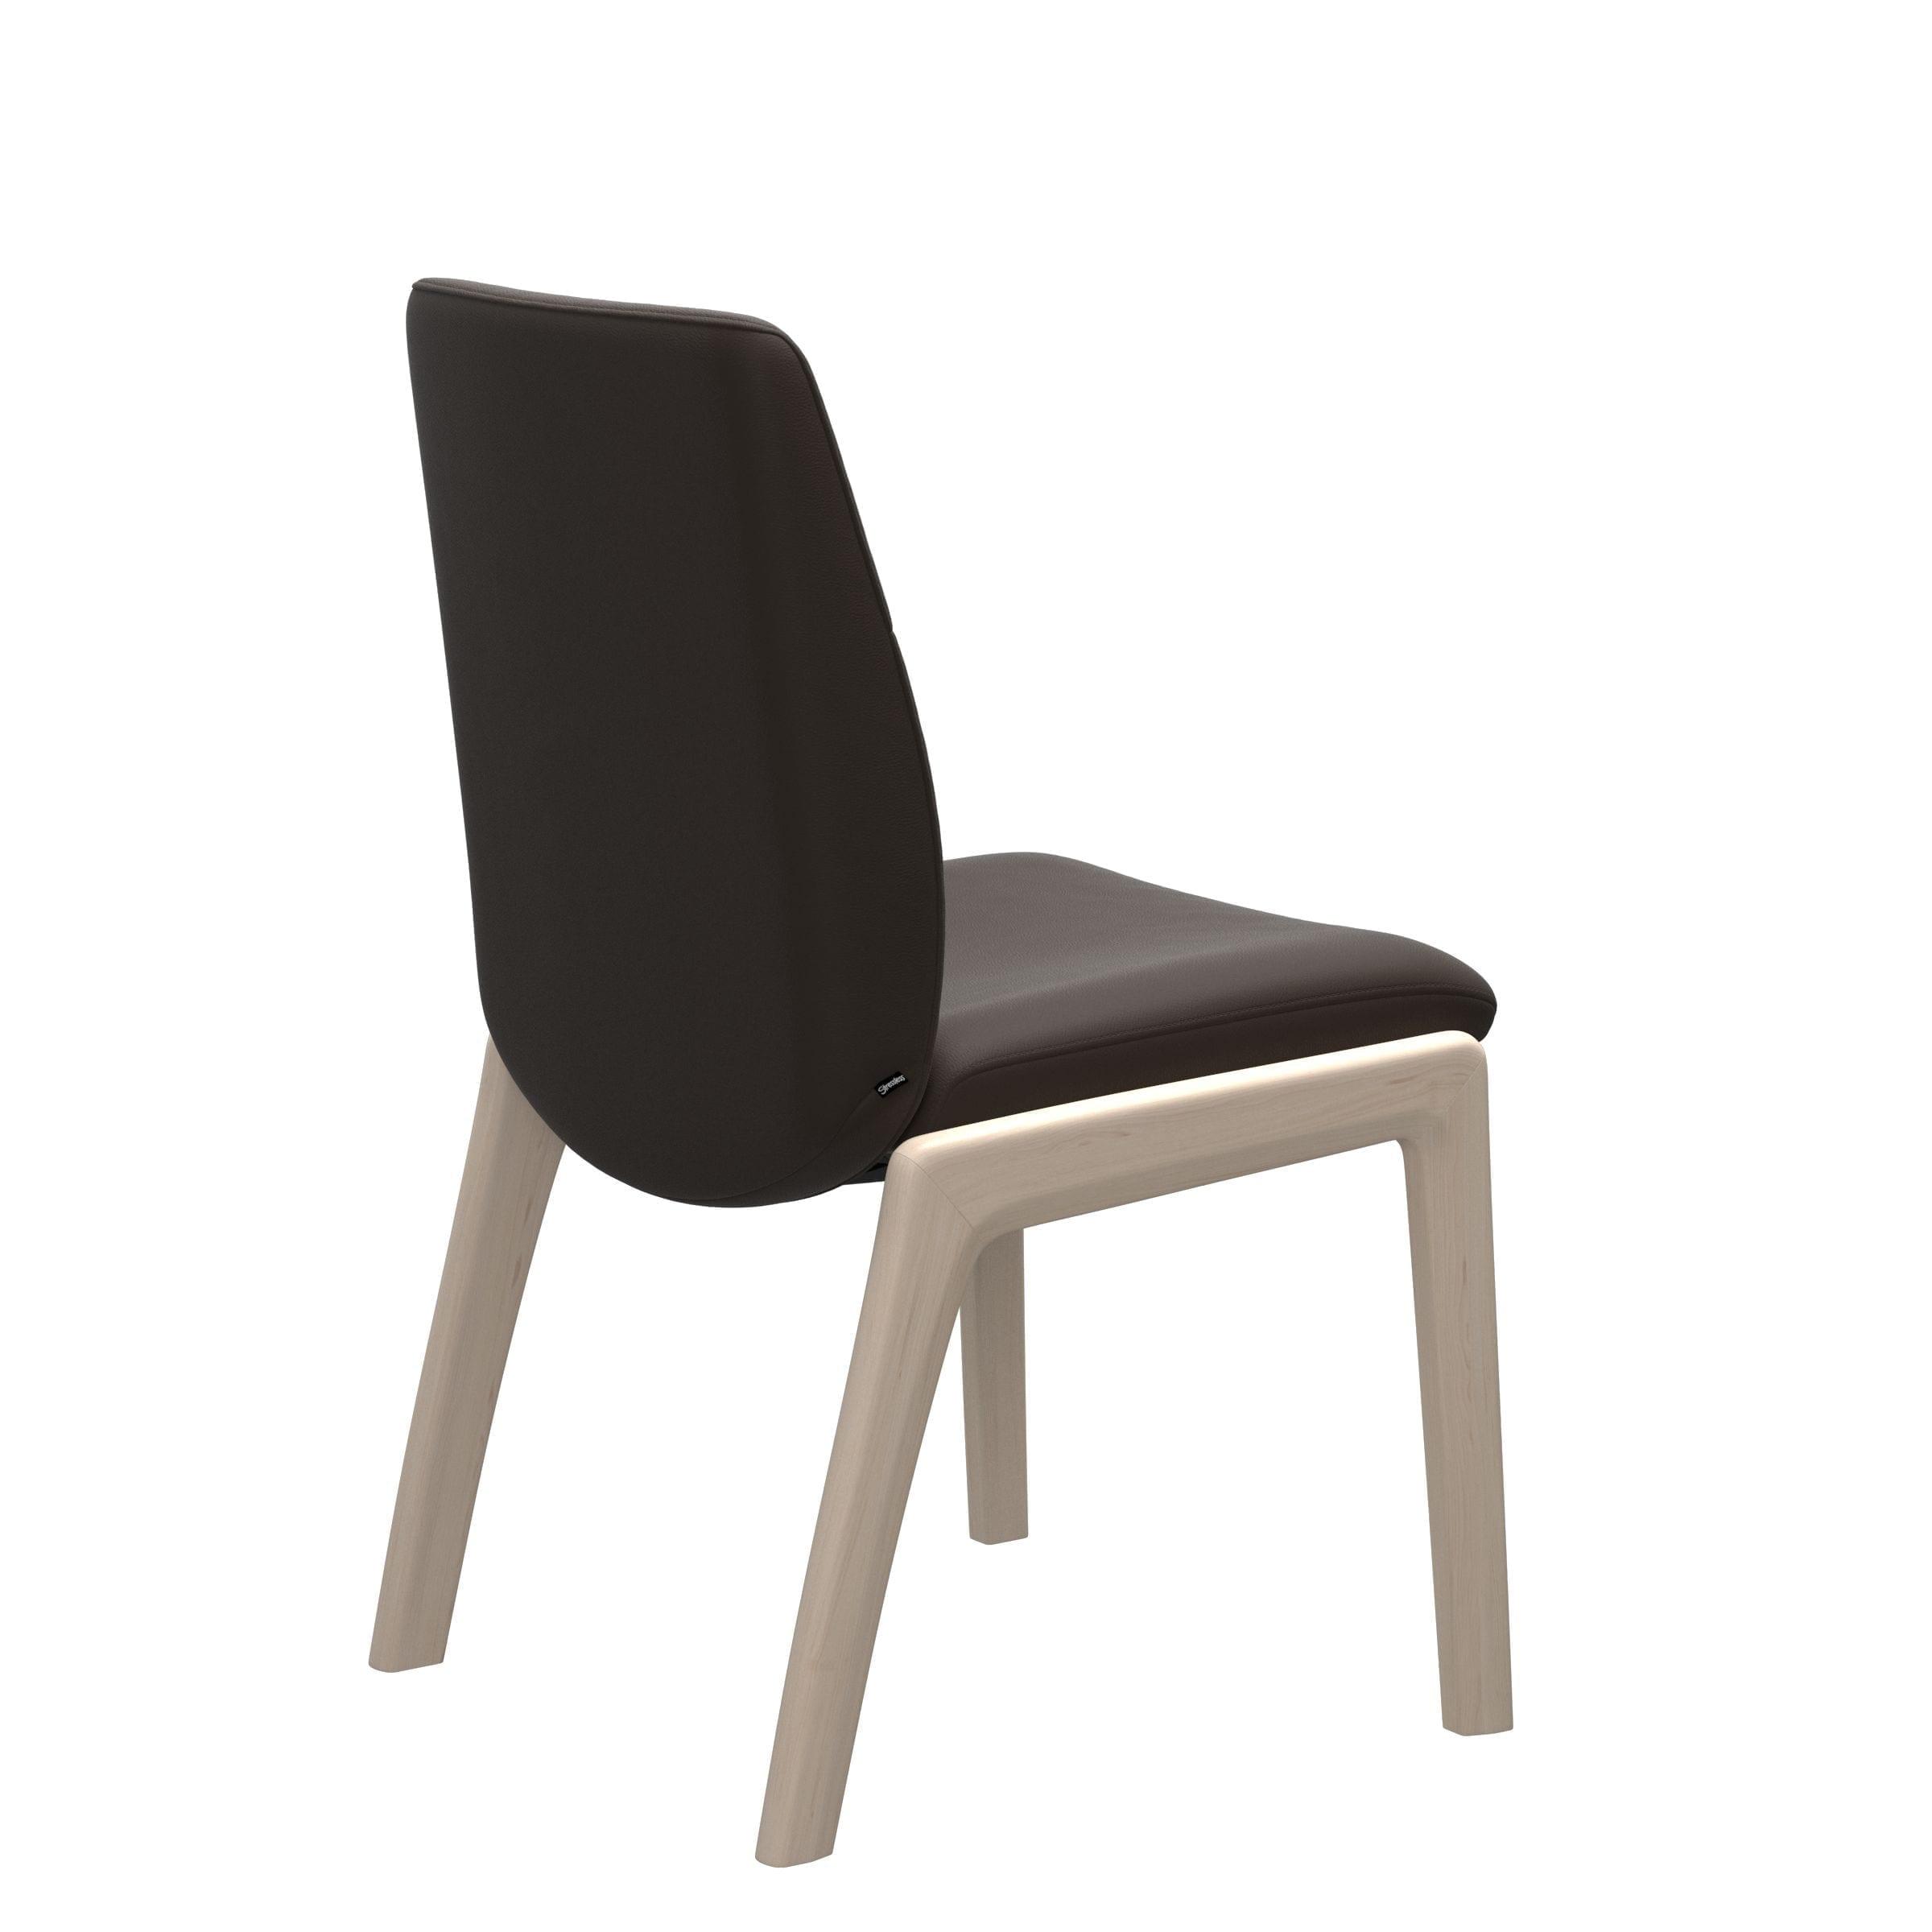 Mint Low Back D100 Chair Stressless 1